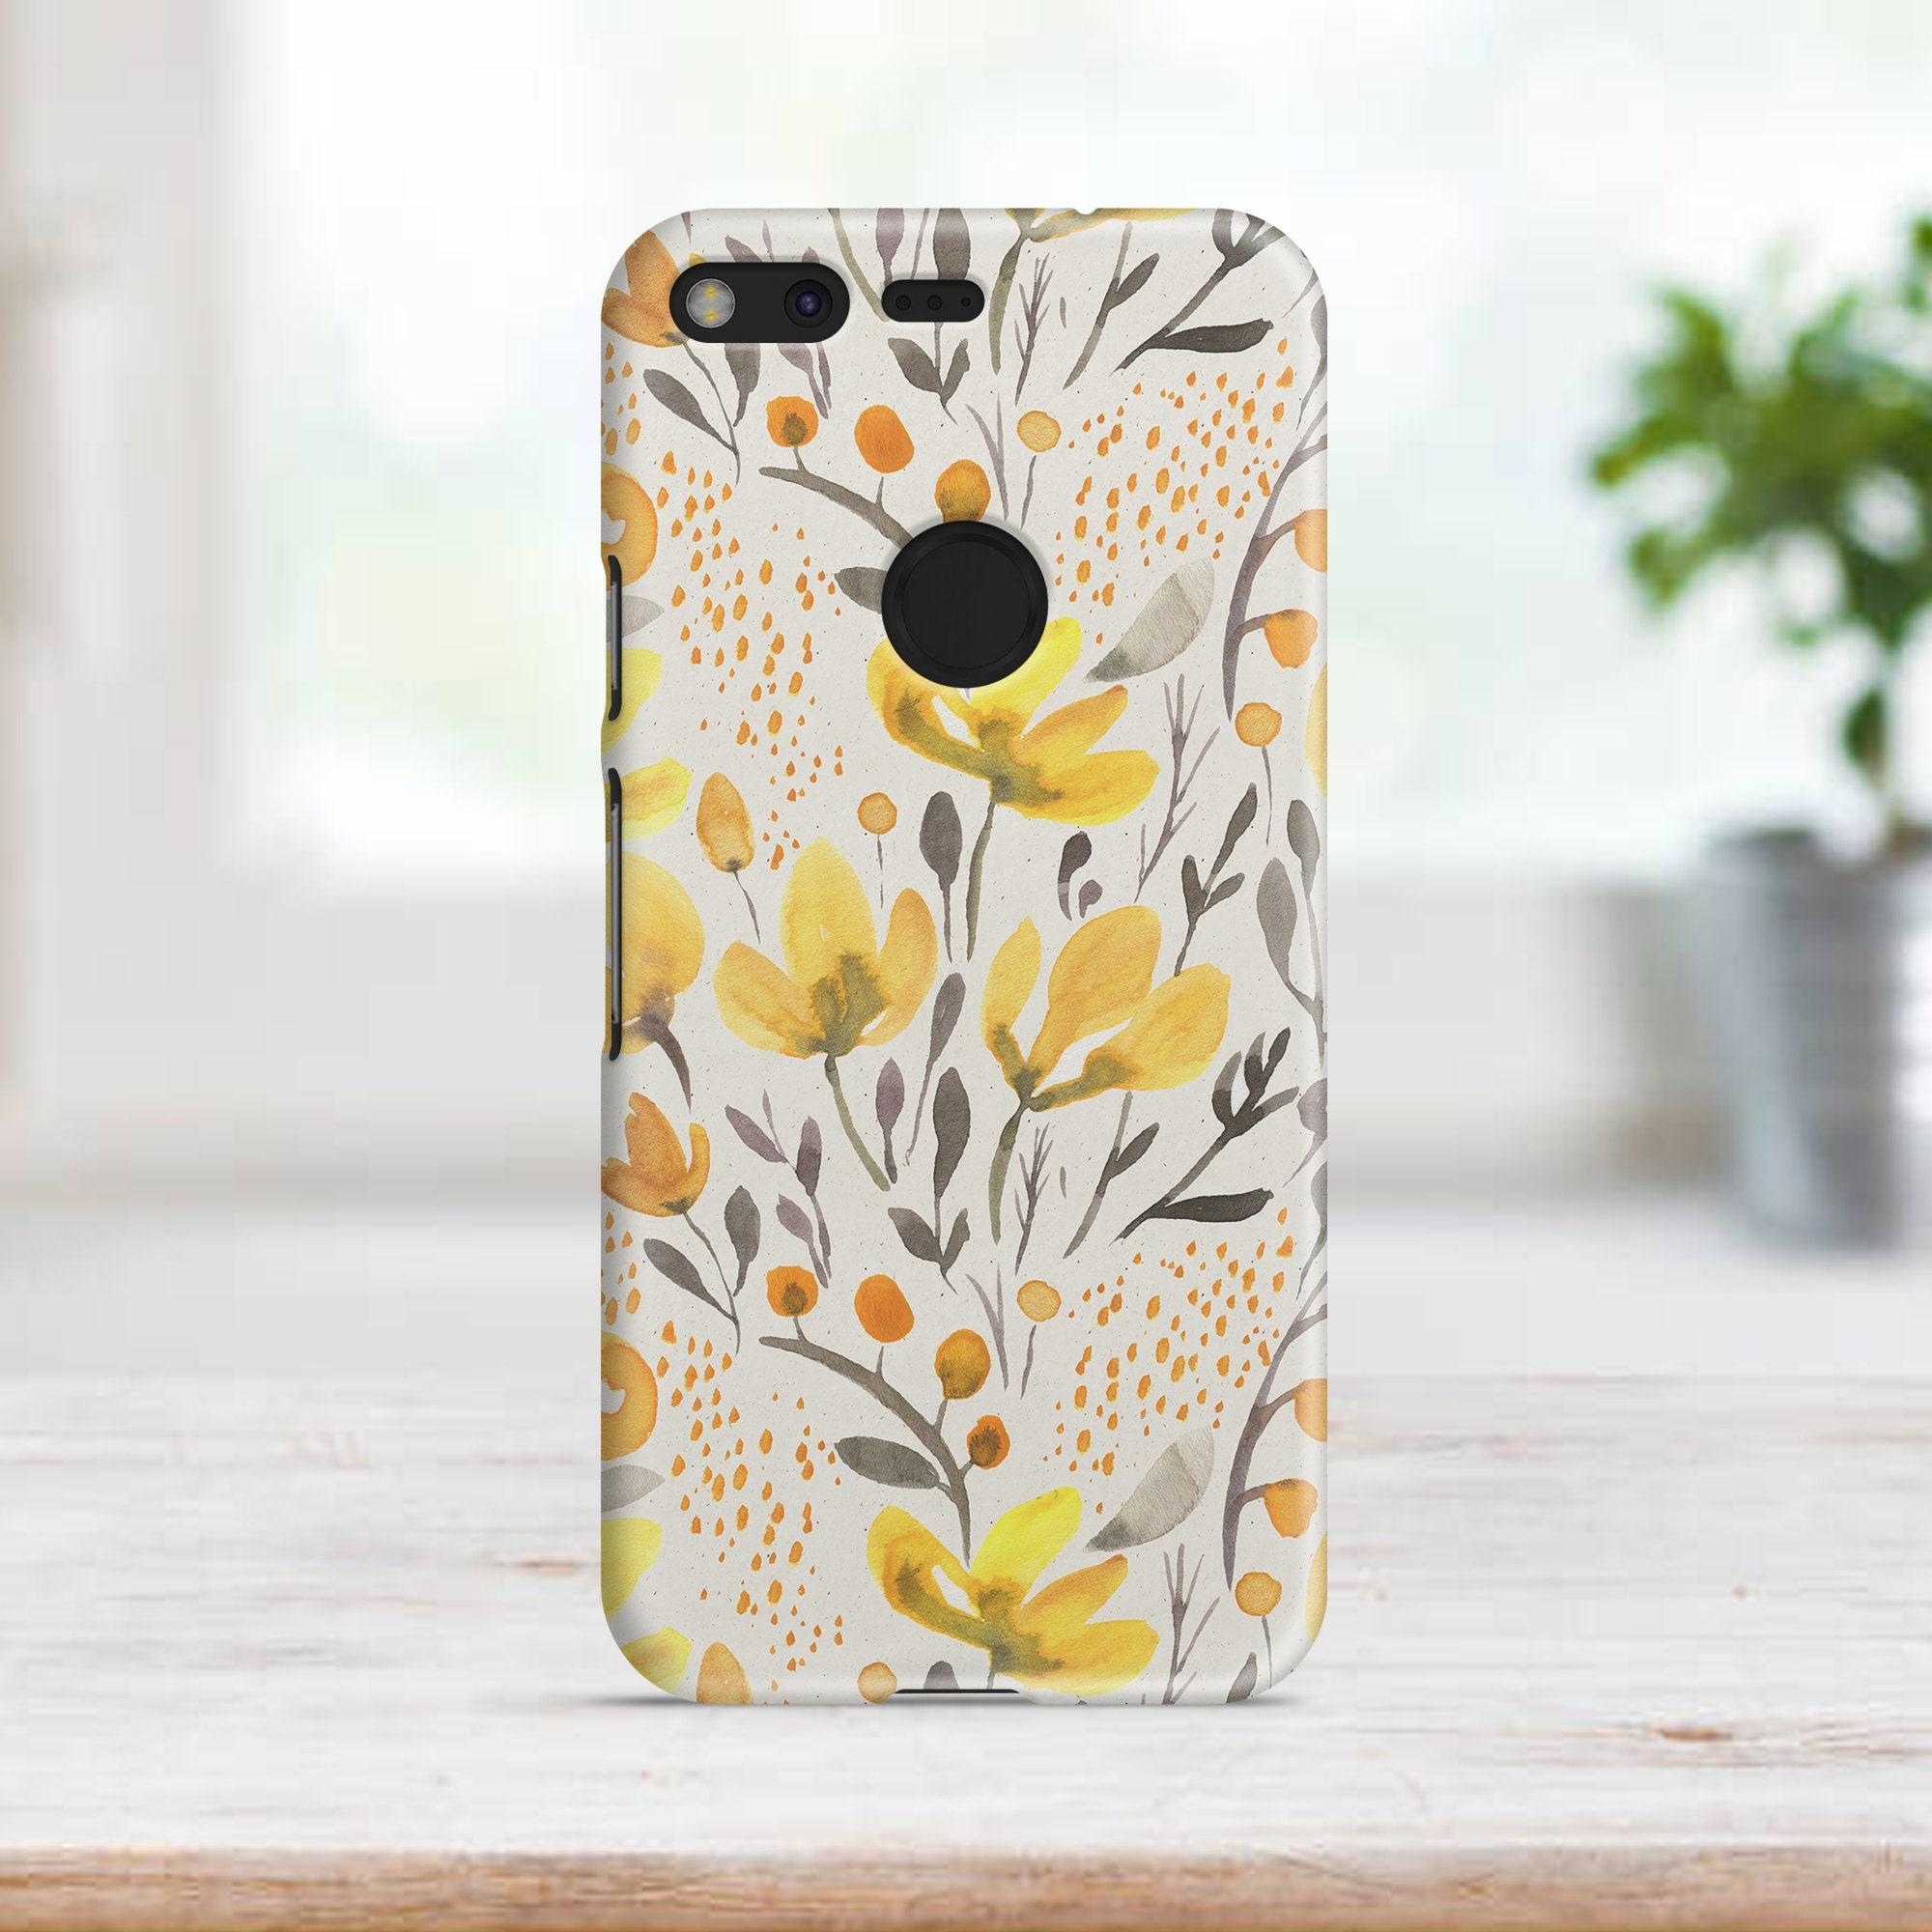 Floral Pixel Case Floral Google Pixel Case Floral Pixel XL Case Floral Google Pixel XL Case Floral Pixel 2 Case Floral Google Pixel 2 Case